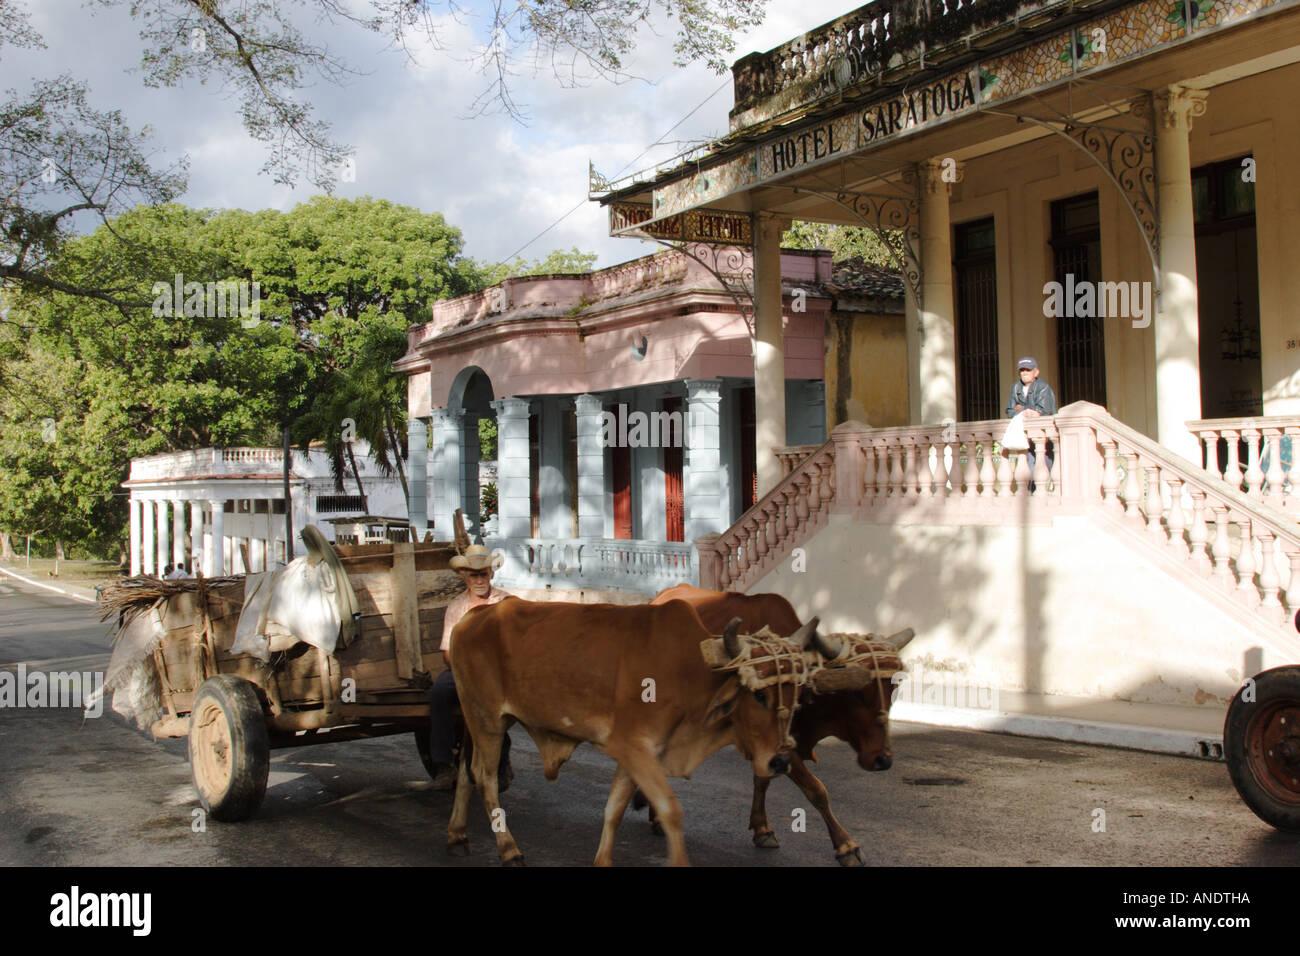 oxen cart outside hotel saratoga san diego de los baos cuba